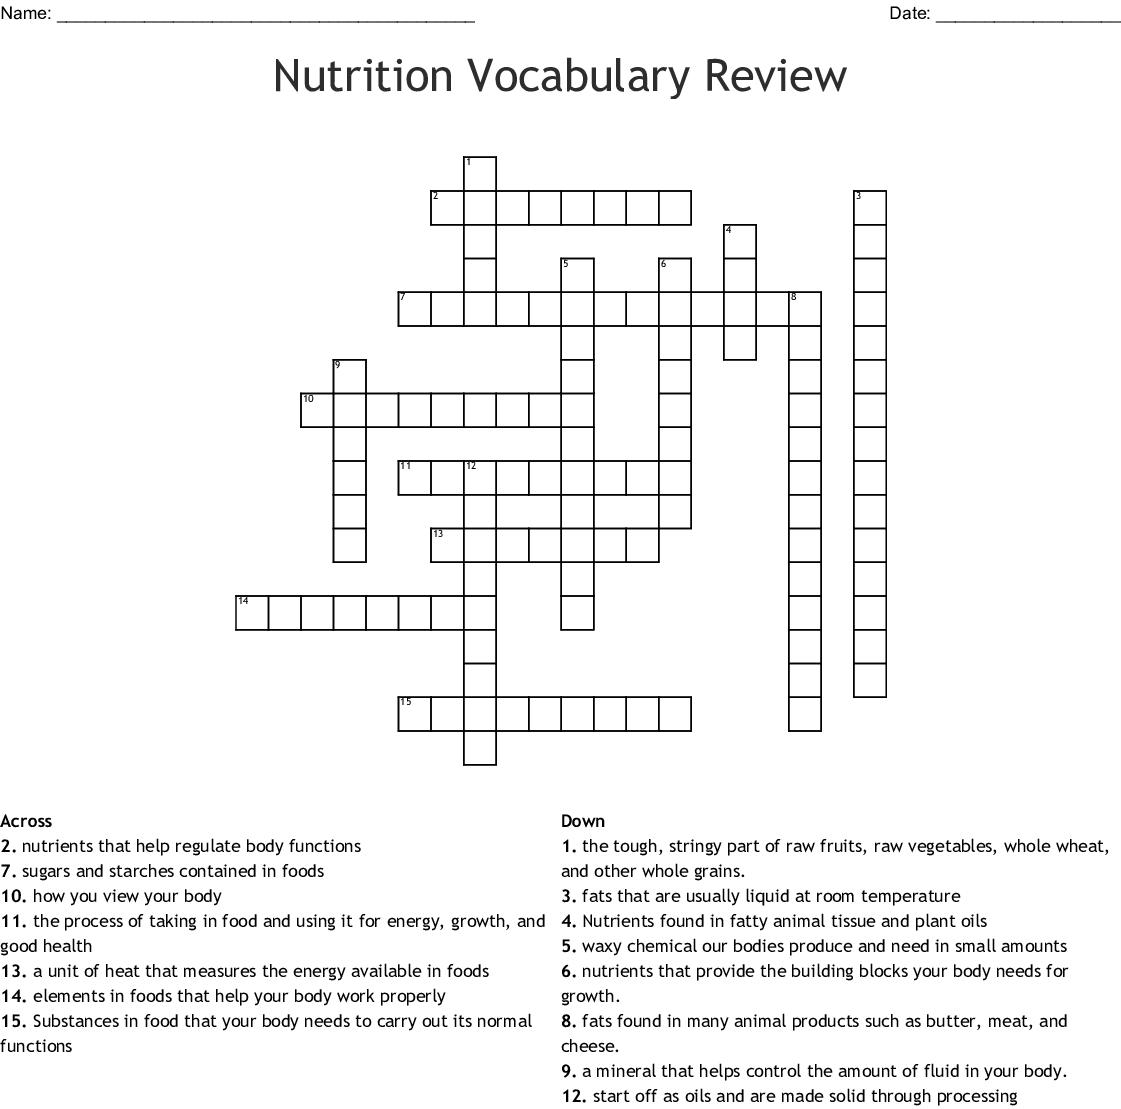 Nutrition Vocabulary Review Crossword